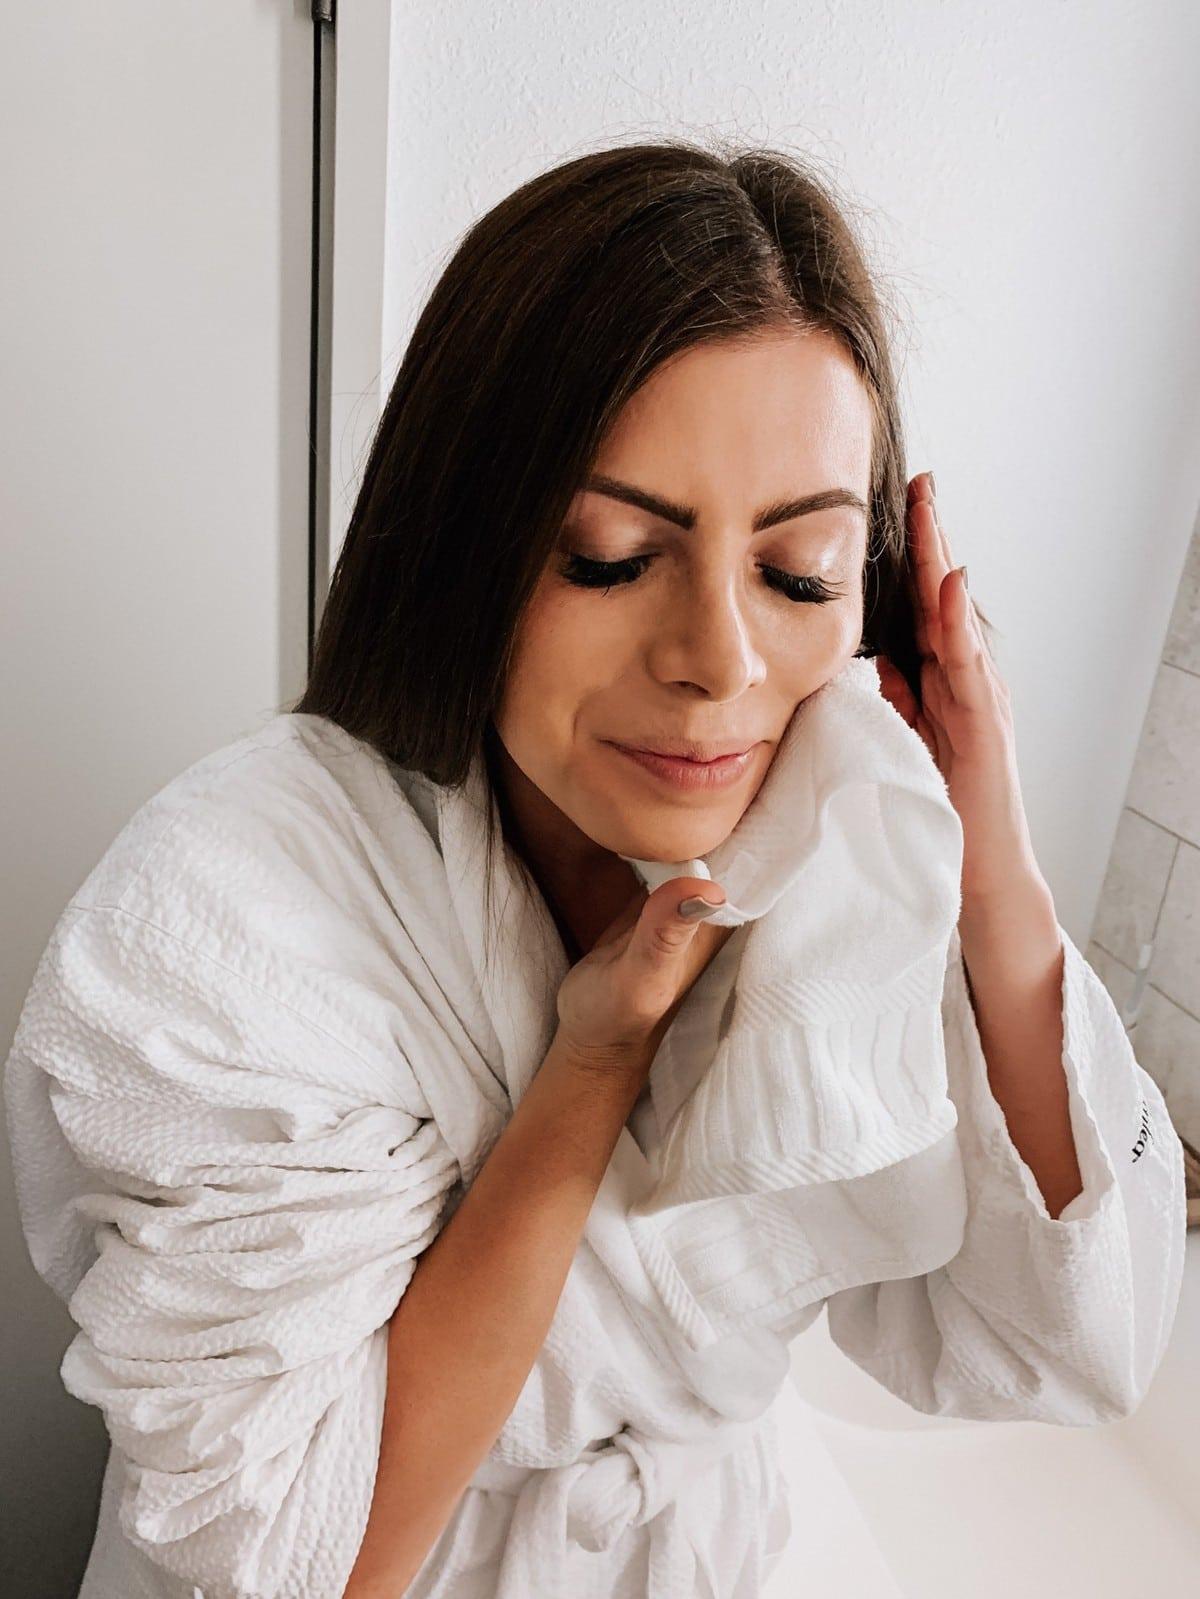 makeup removing washcloth